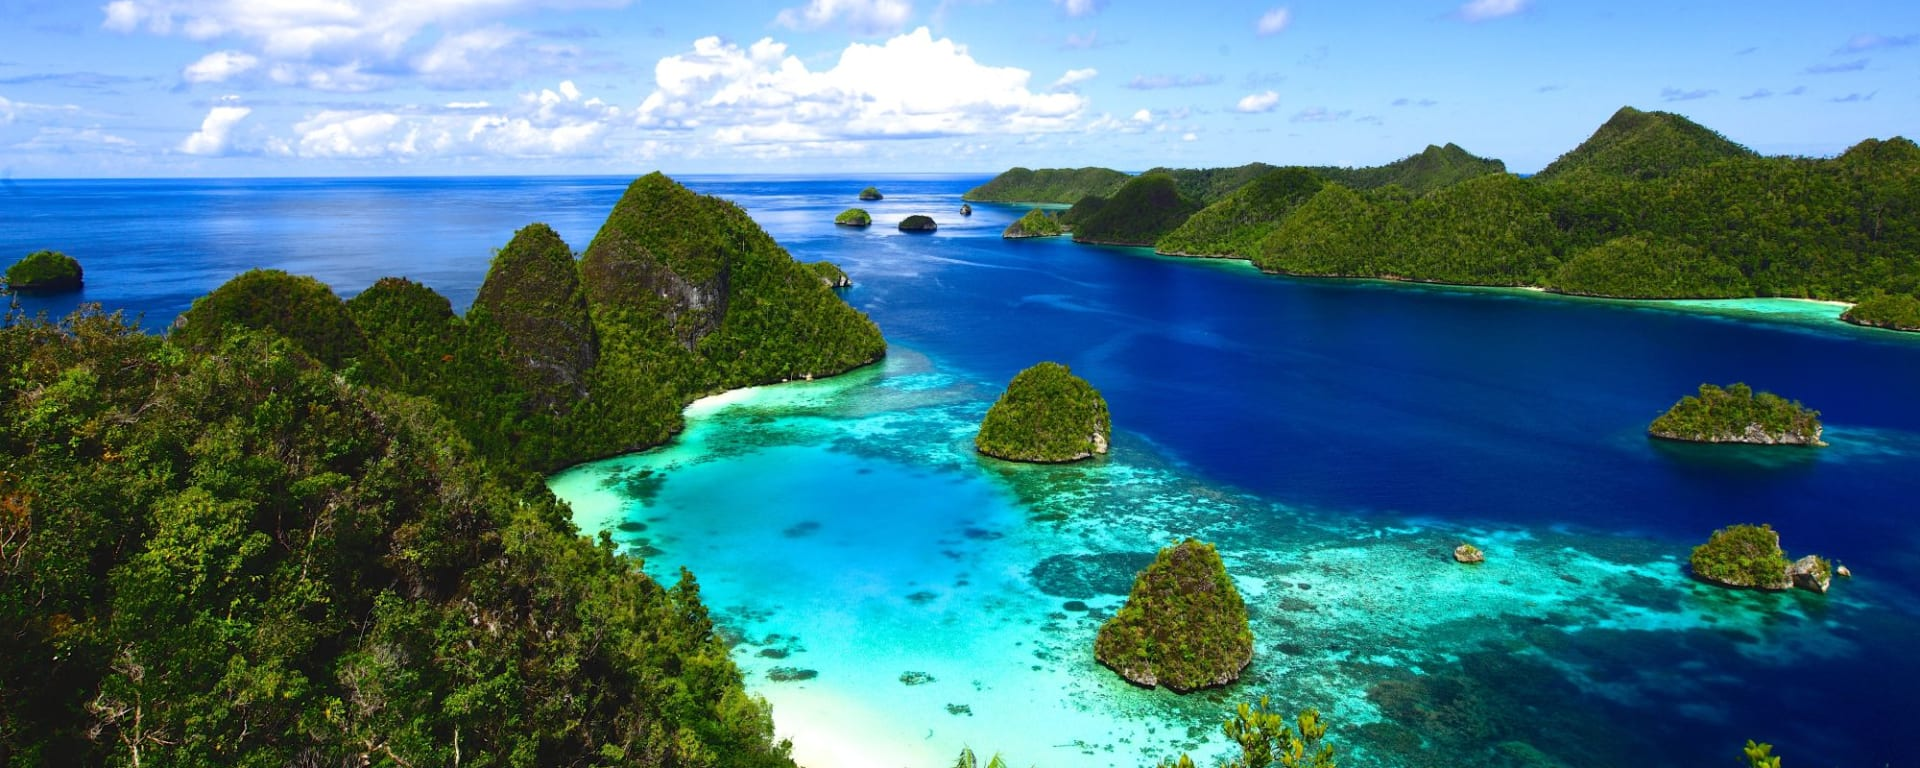 Kreuzfahrt im Inselparadies Raja Ampat ab Sorong: Raja Ampat